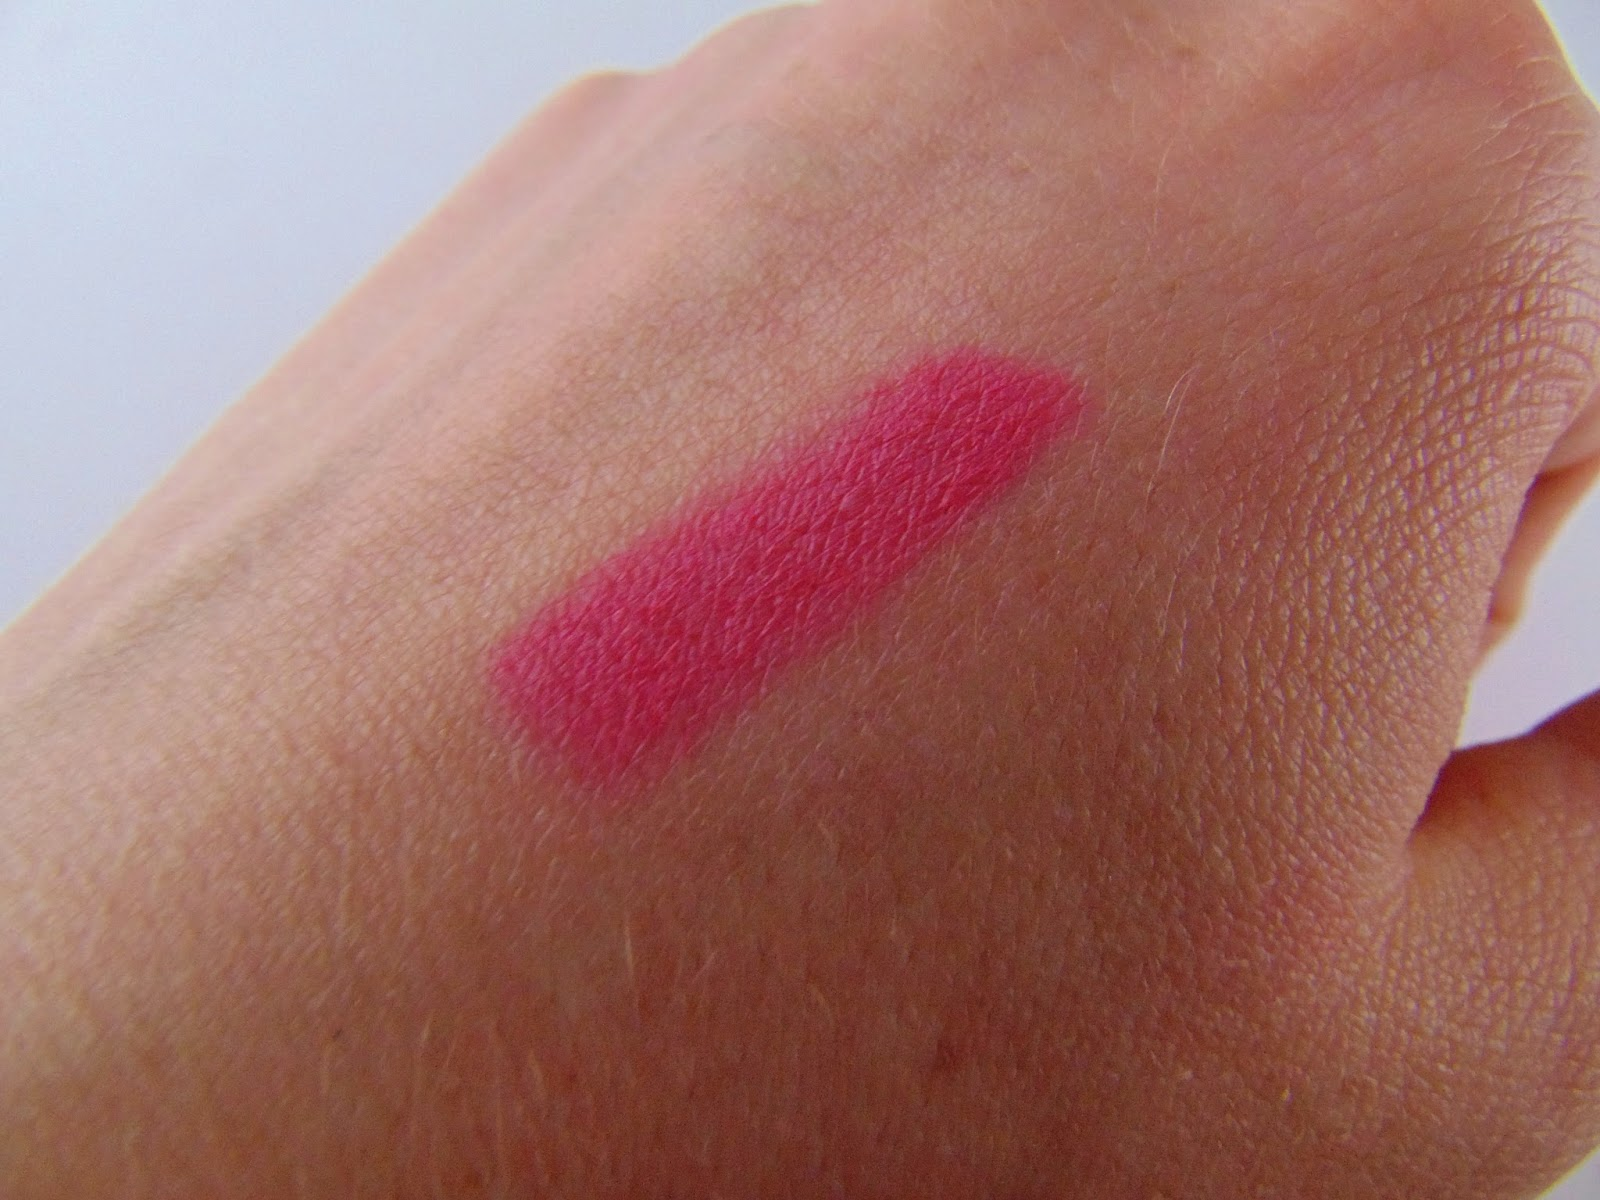 Catrice LE - Rock-O-CO - Matt Lip Colour Swatch- www.annitschkasblog.de